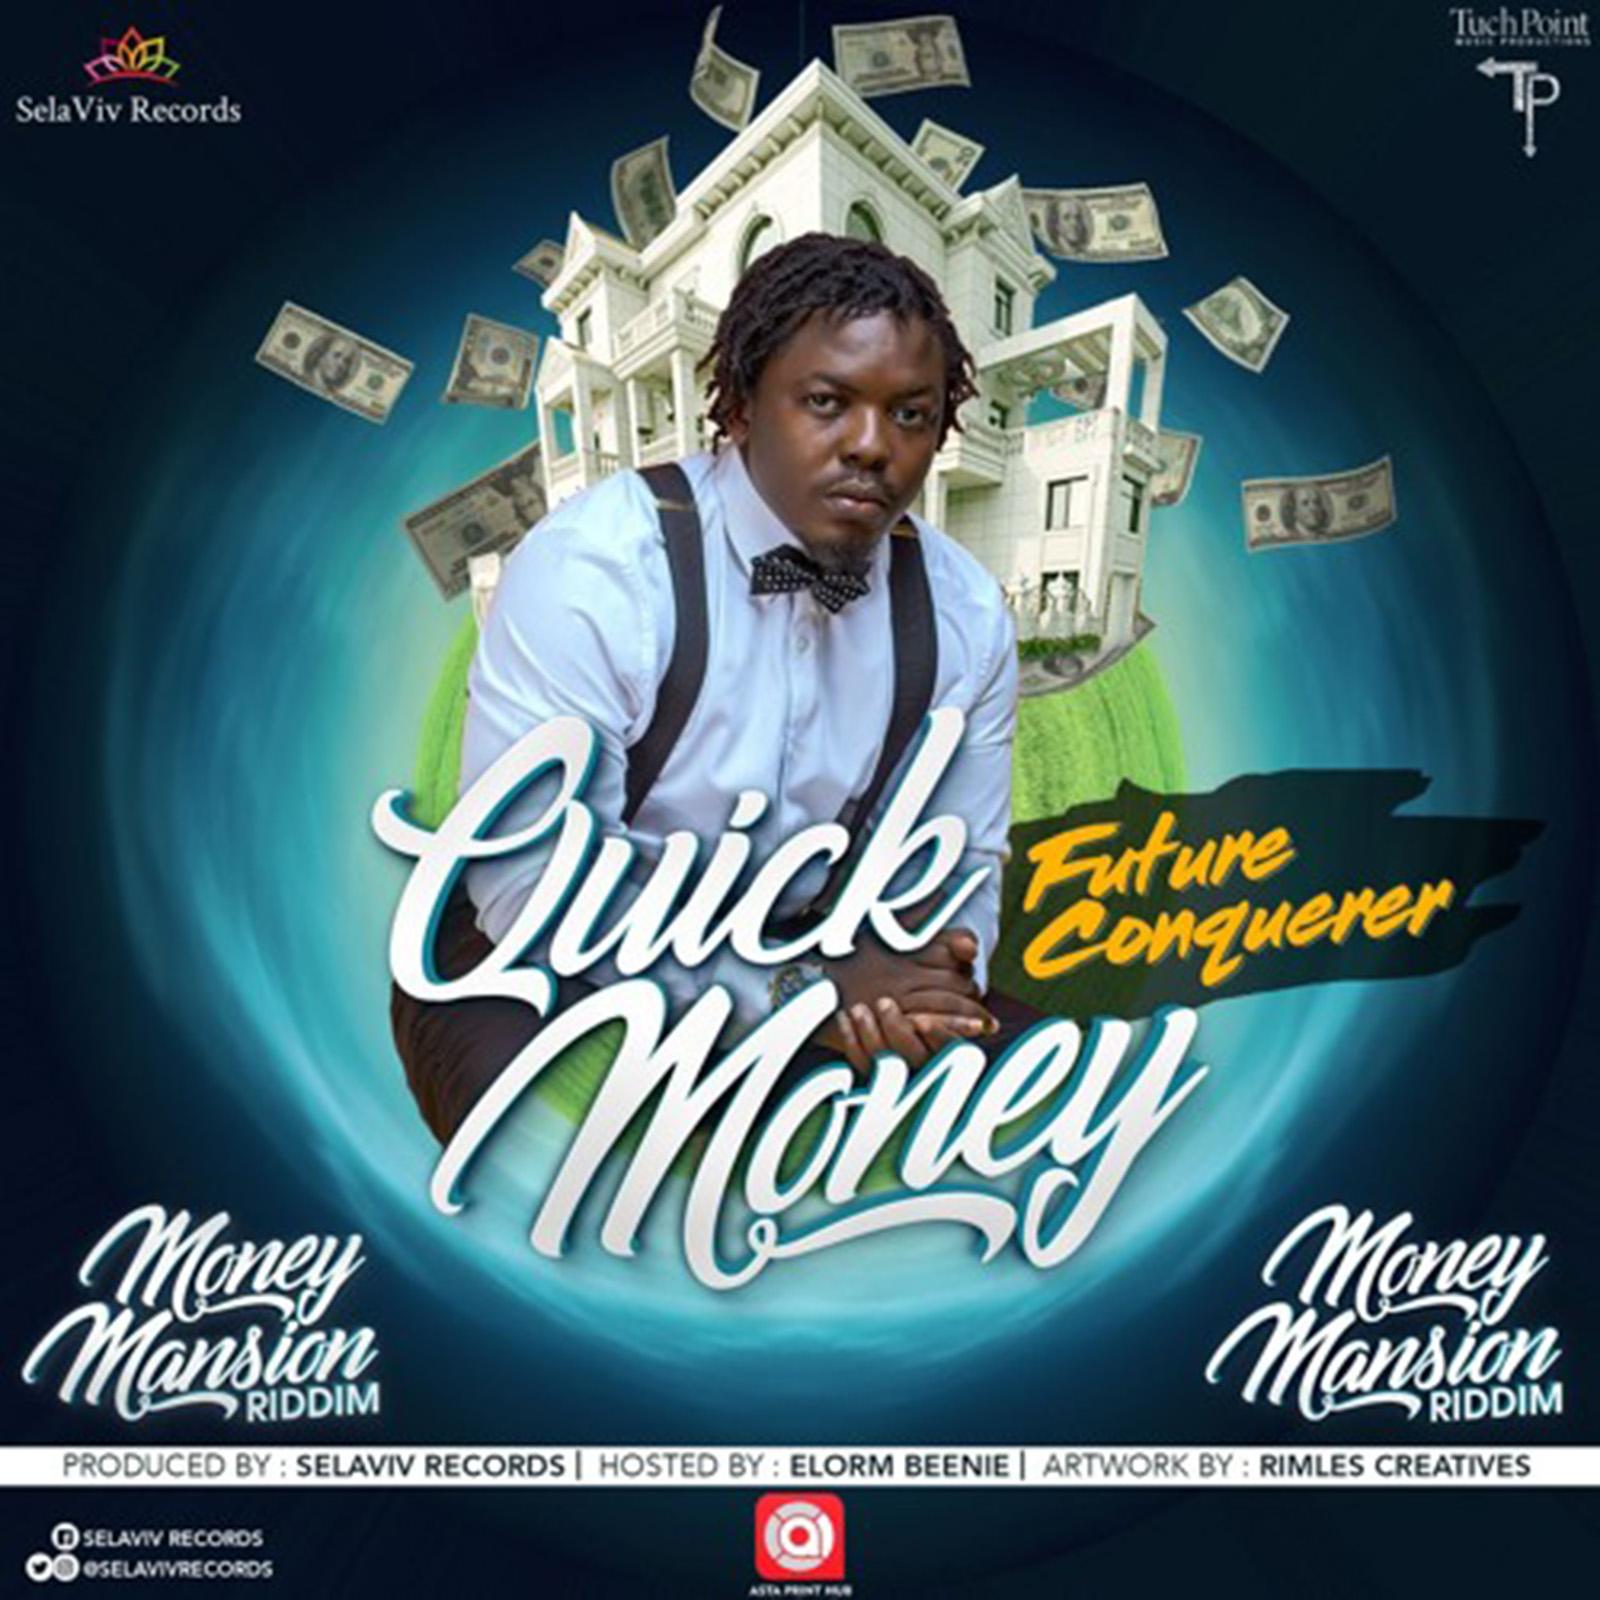 Quick Money(Money Mansion Riddim) by Future Conquerer